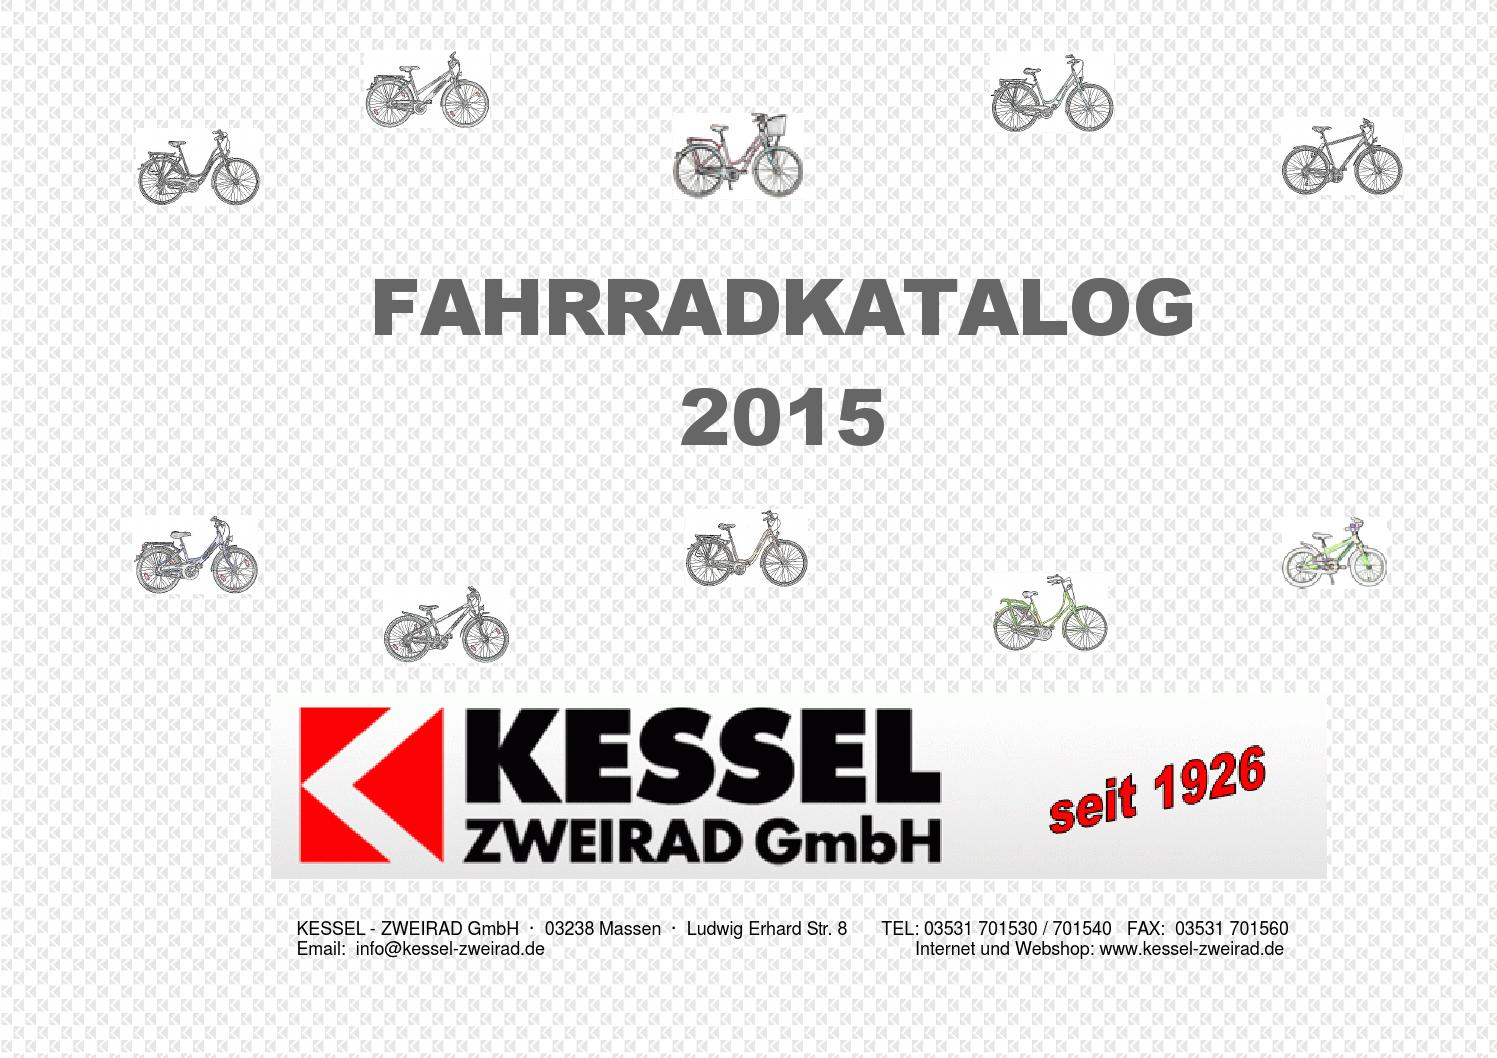 Kessel Zweirad Fahrrad Katalog 2015 by Julian Winter - issuu